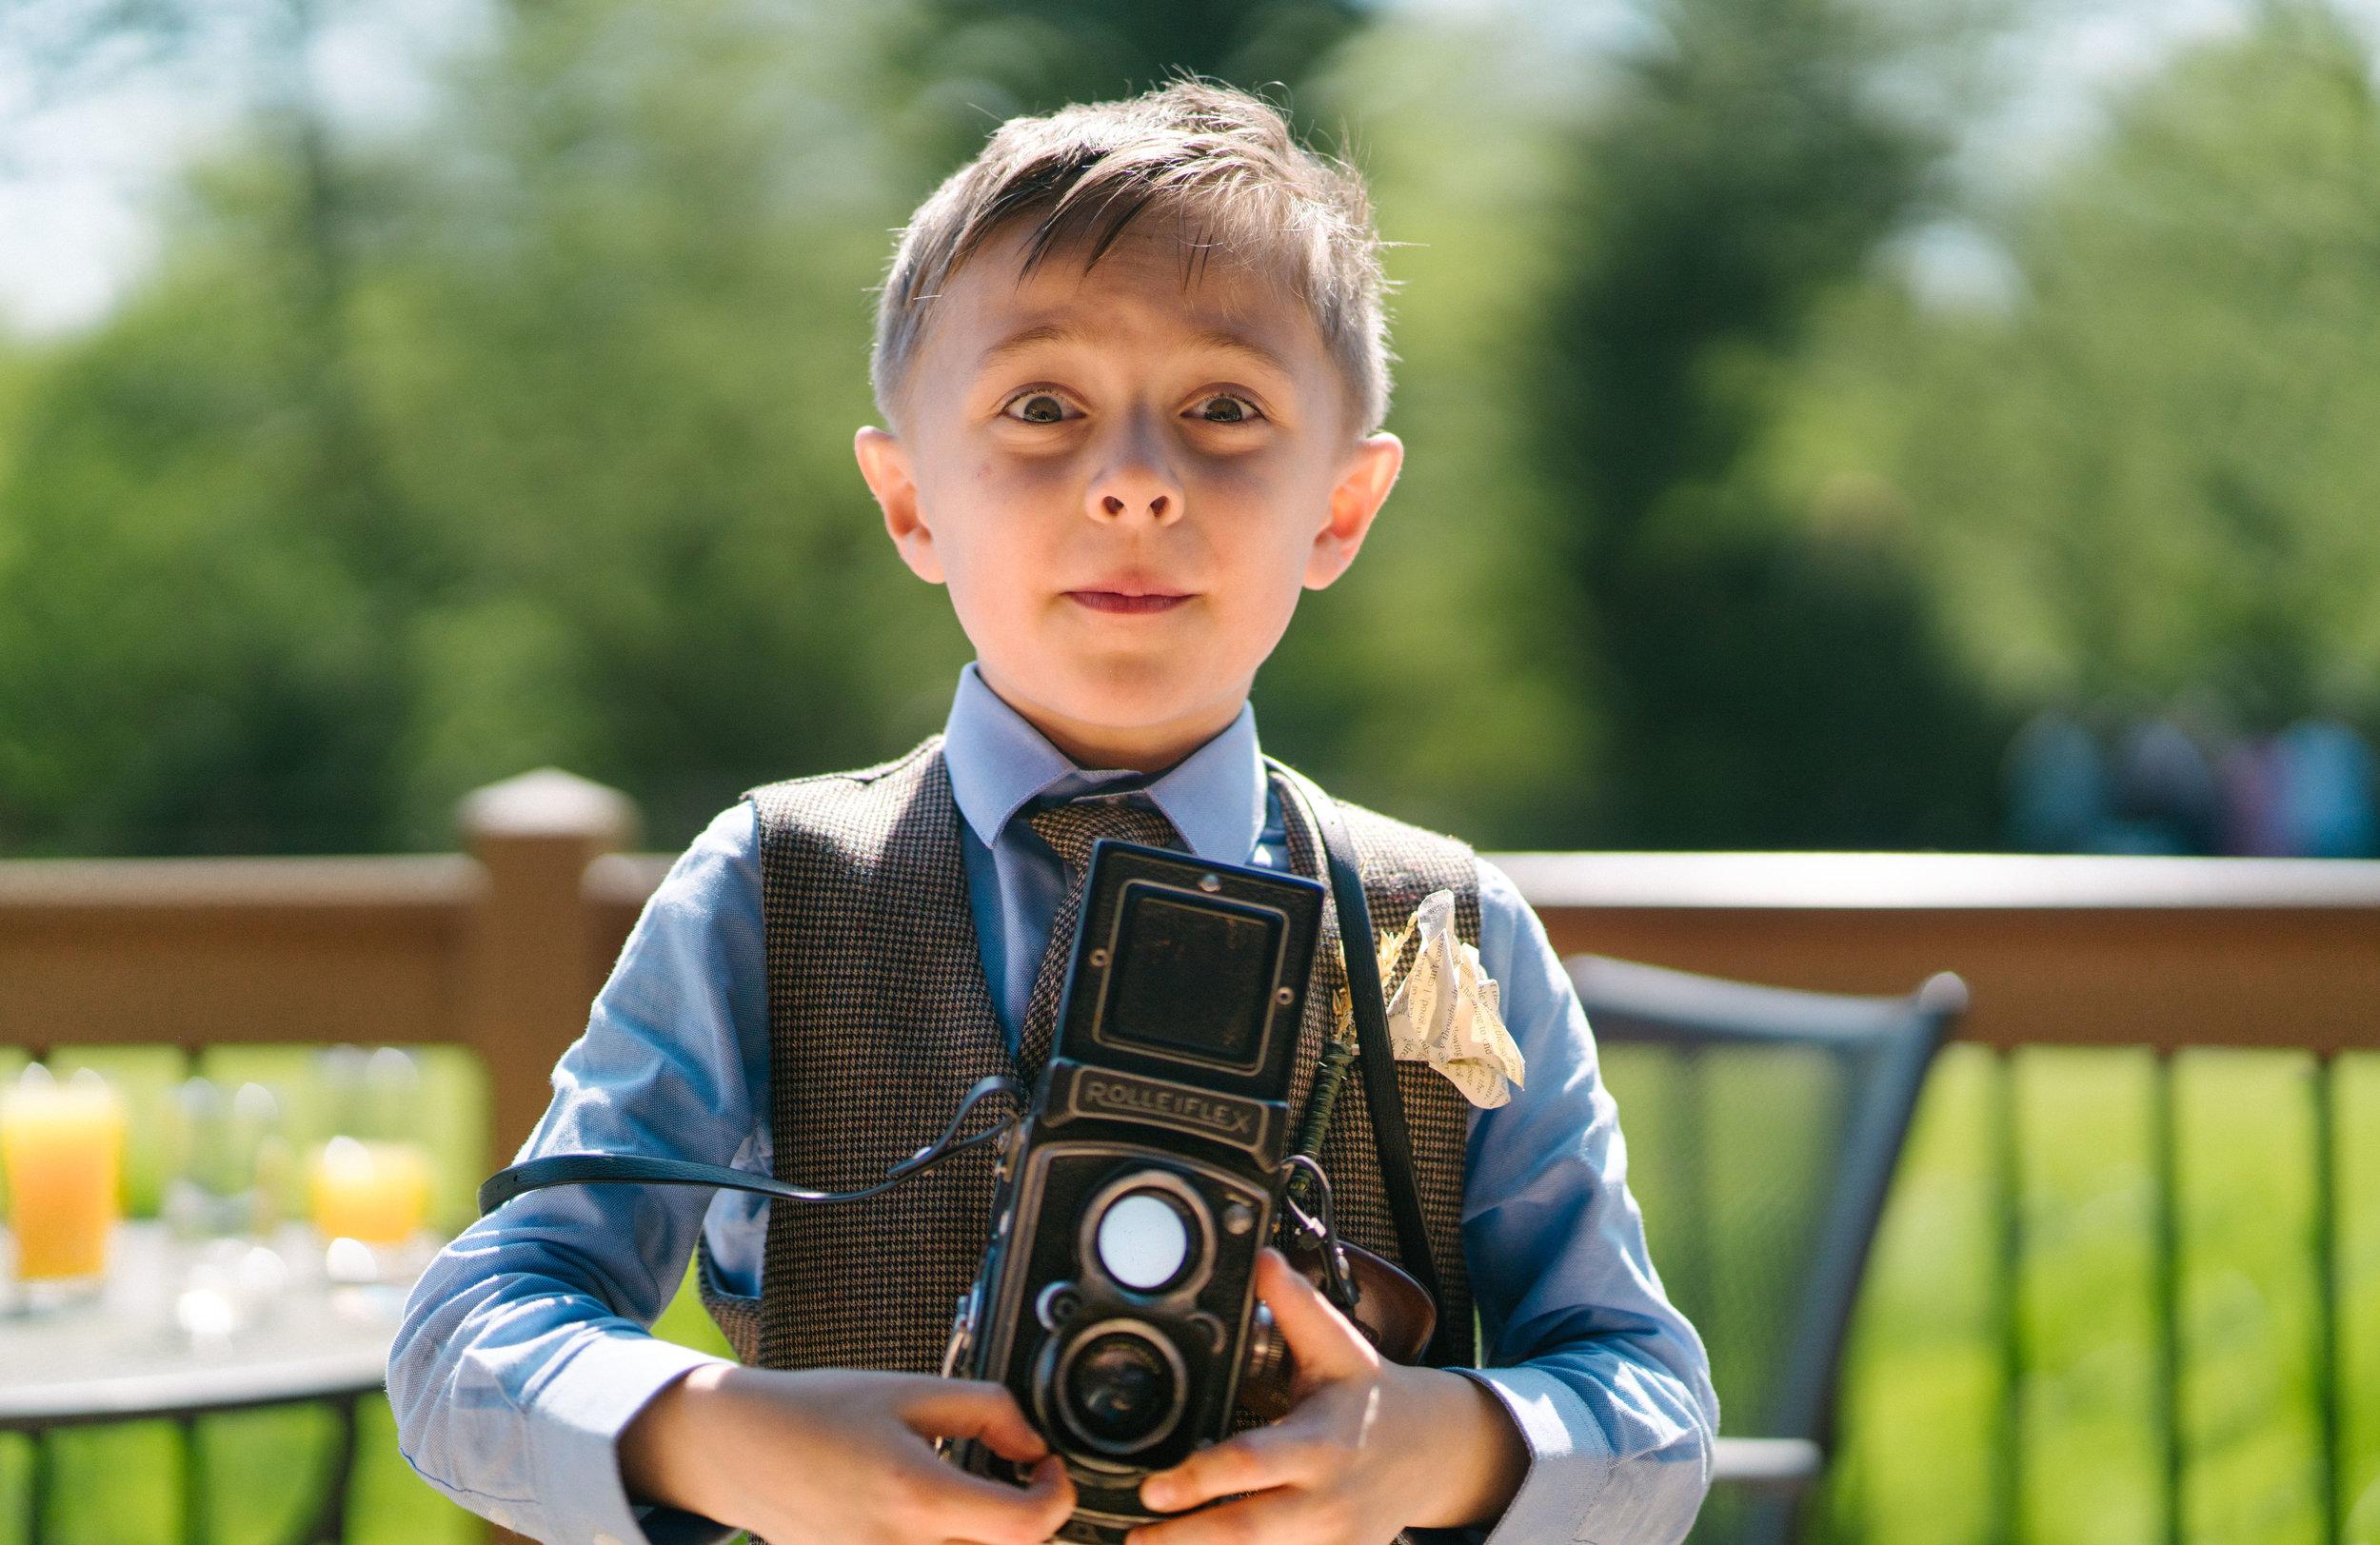 london-hertfordshire-vintage-wedding-photographer-tewinburyfarm-rolleiflex-film-camera-01